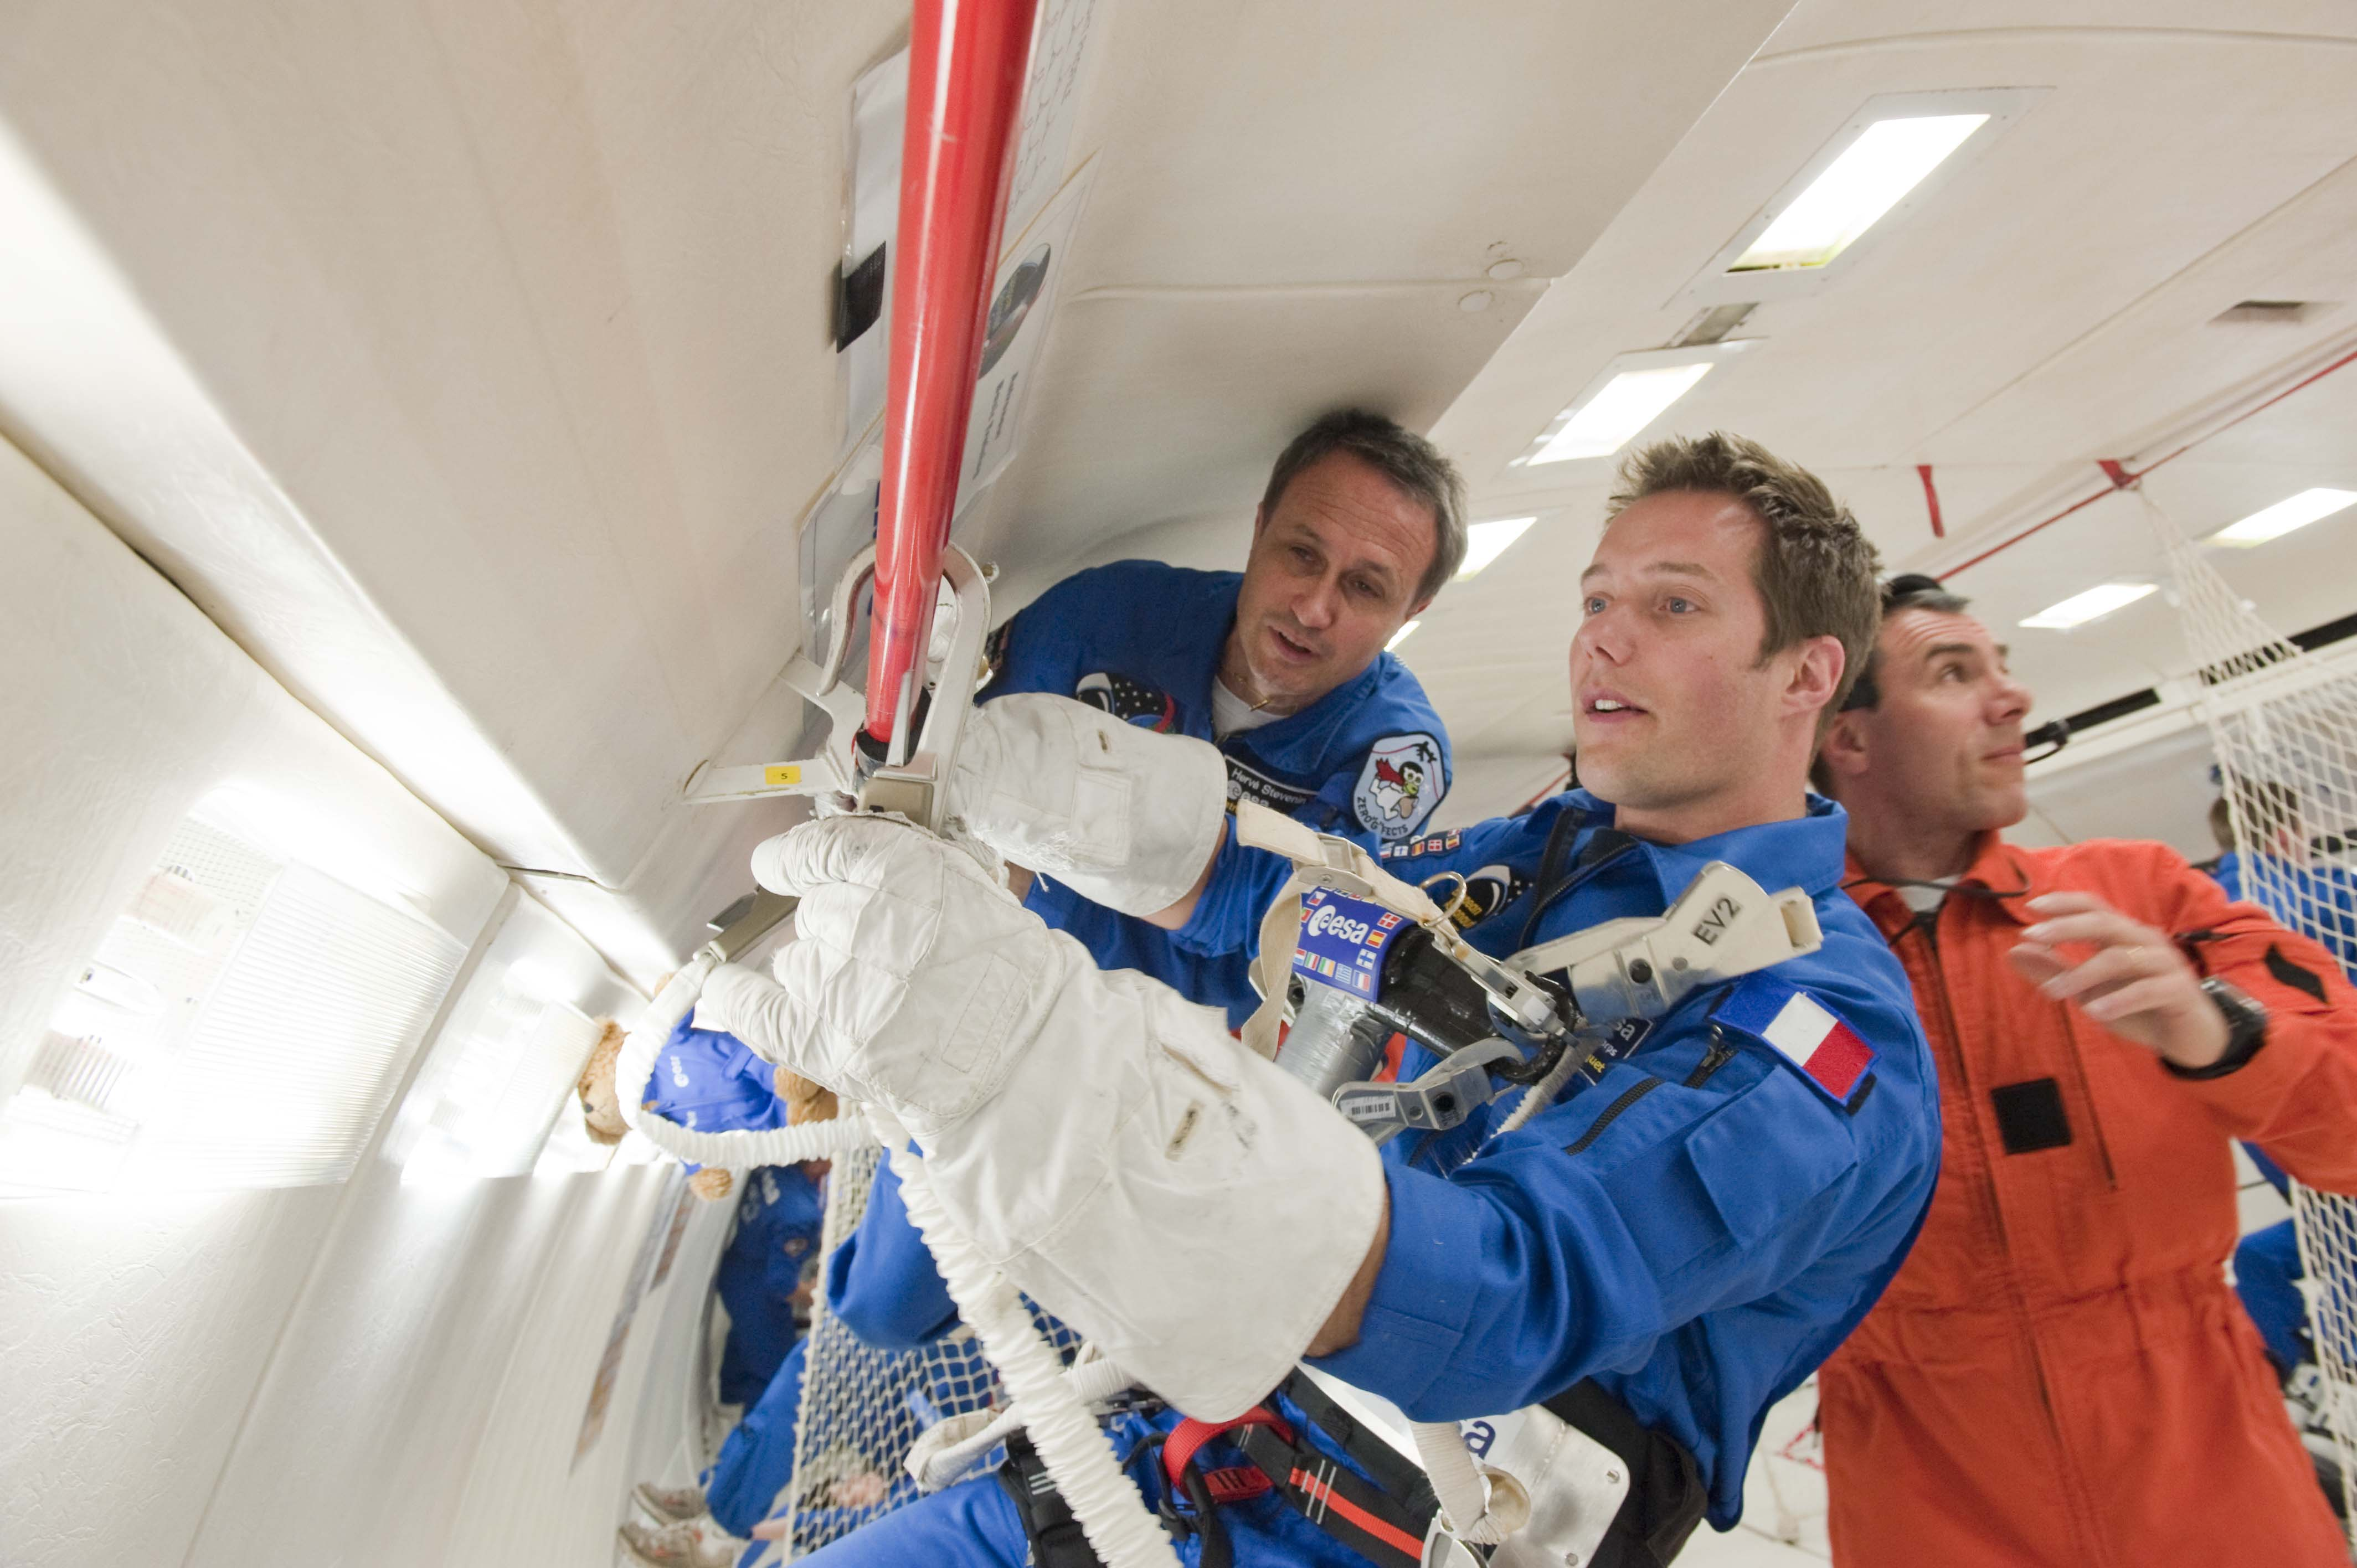 prx_thomas_pesquet_testing_a_space_suit_gloves.jpg